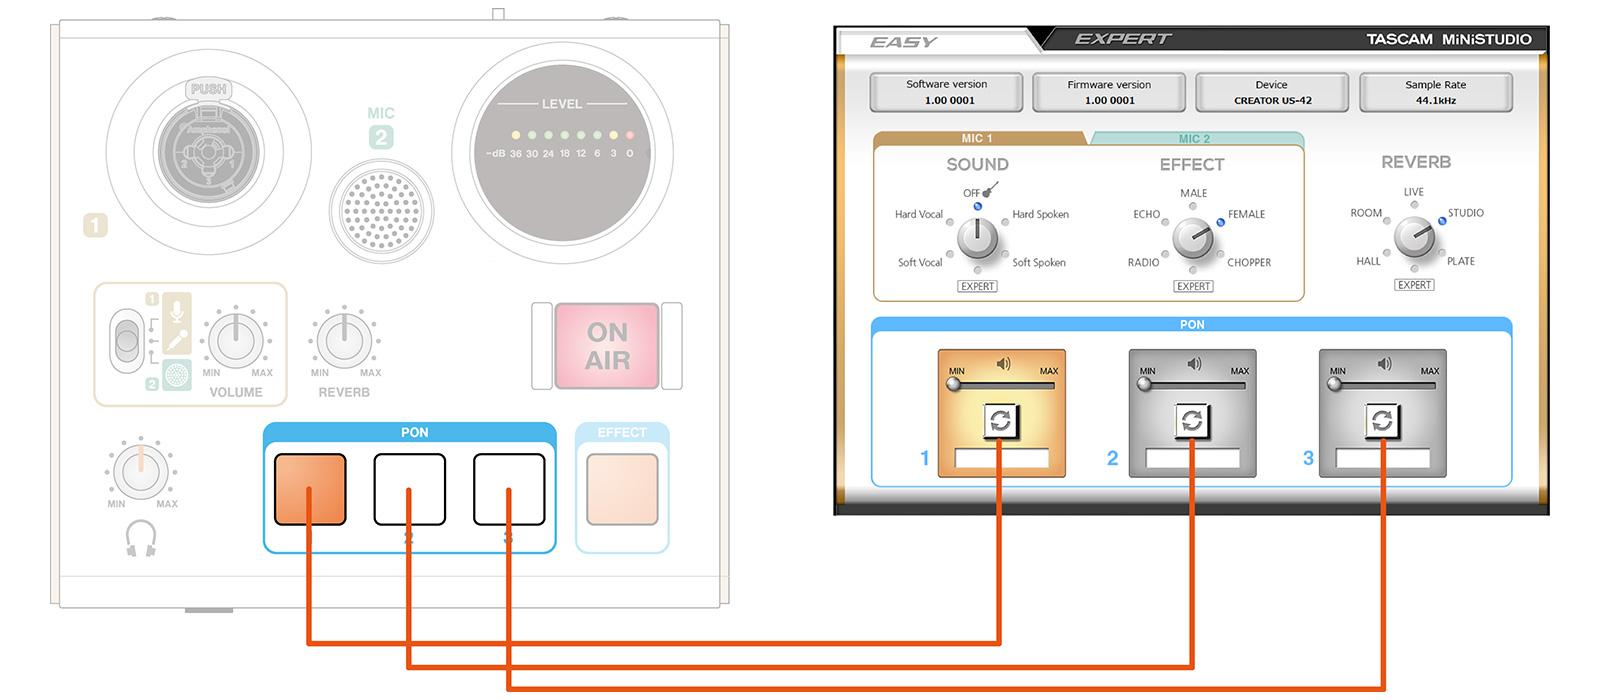 Ministudio Creator Us 42 Features Tascam International Website Mini Usb Car Charger Wiring Diagram Moreover Puter Speaker Circuit Personal 32